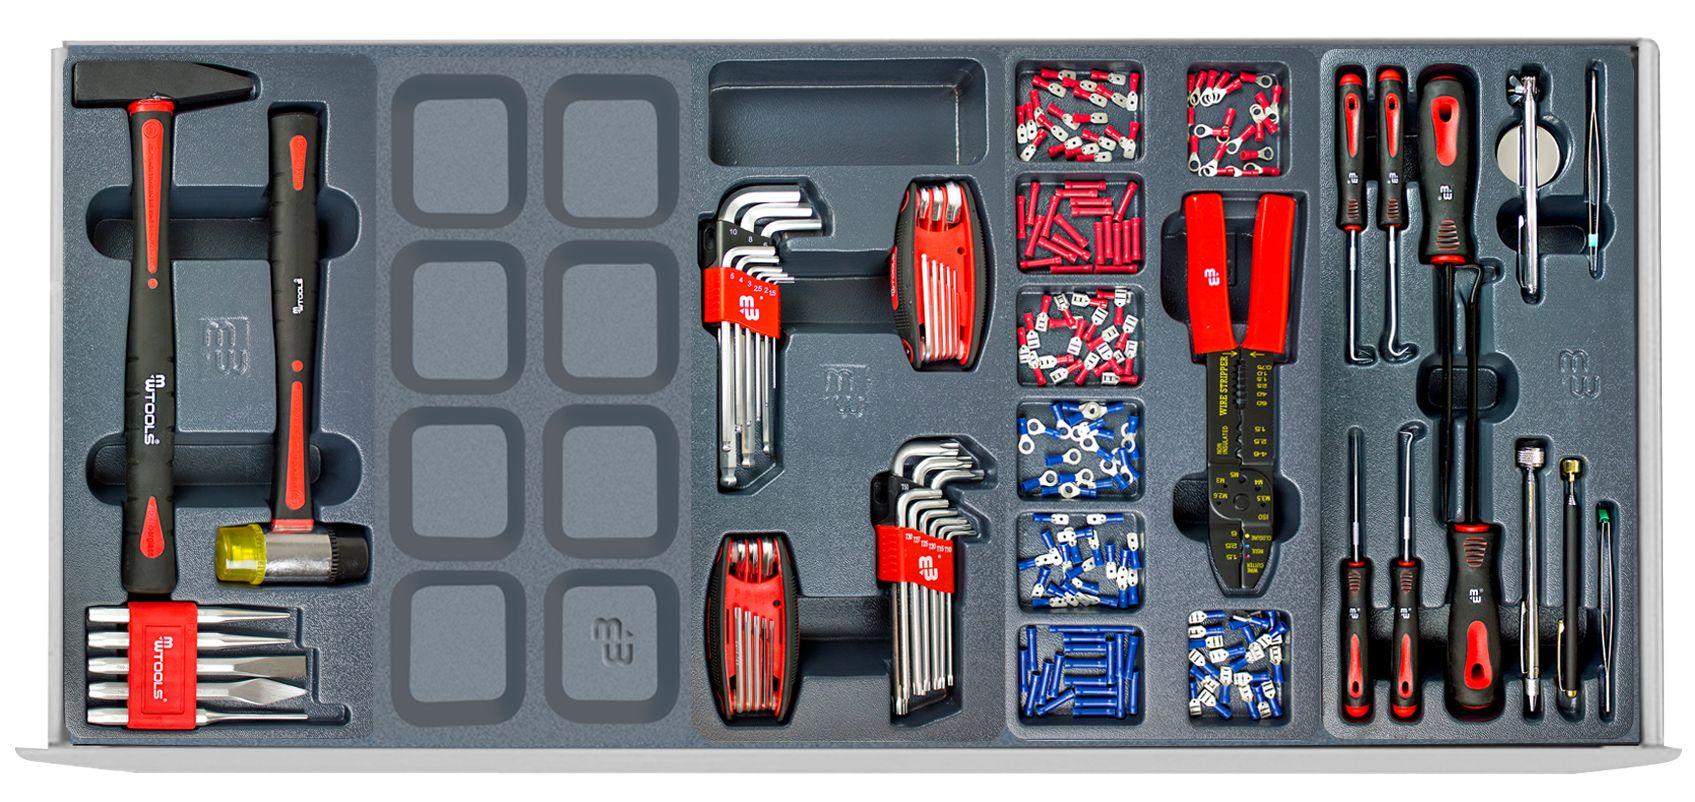 servante d 39 atelier compl te extra large 690 outils. Black Bedroom Furniture Sets. Home Design Ideas